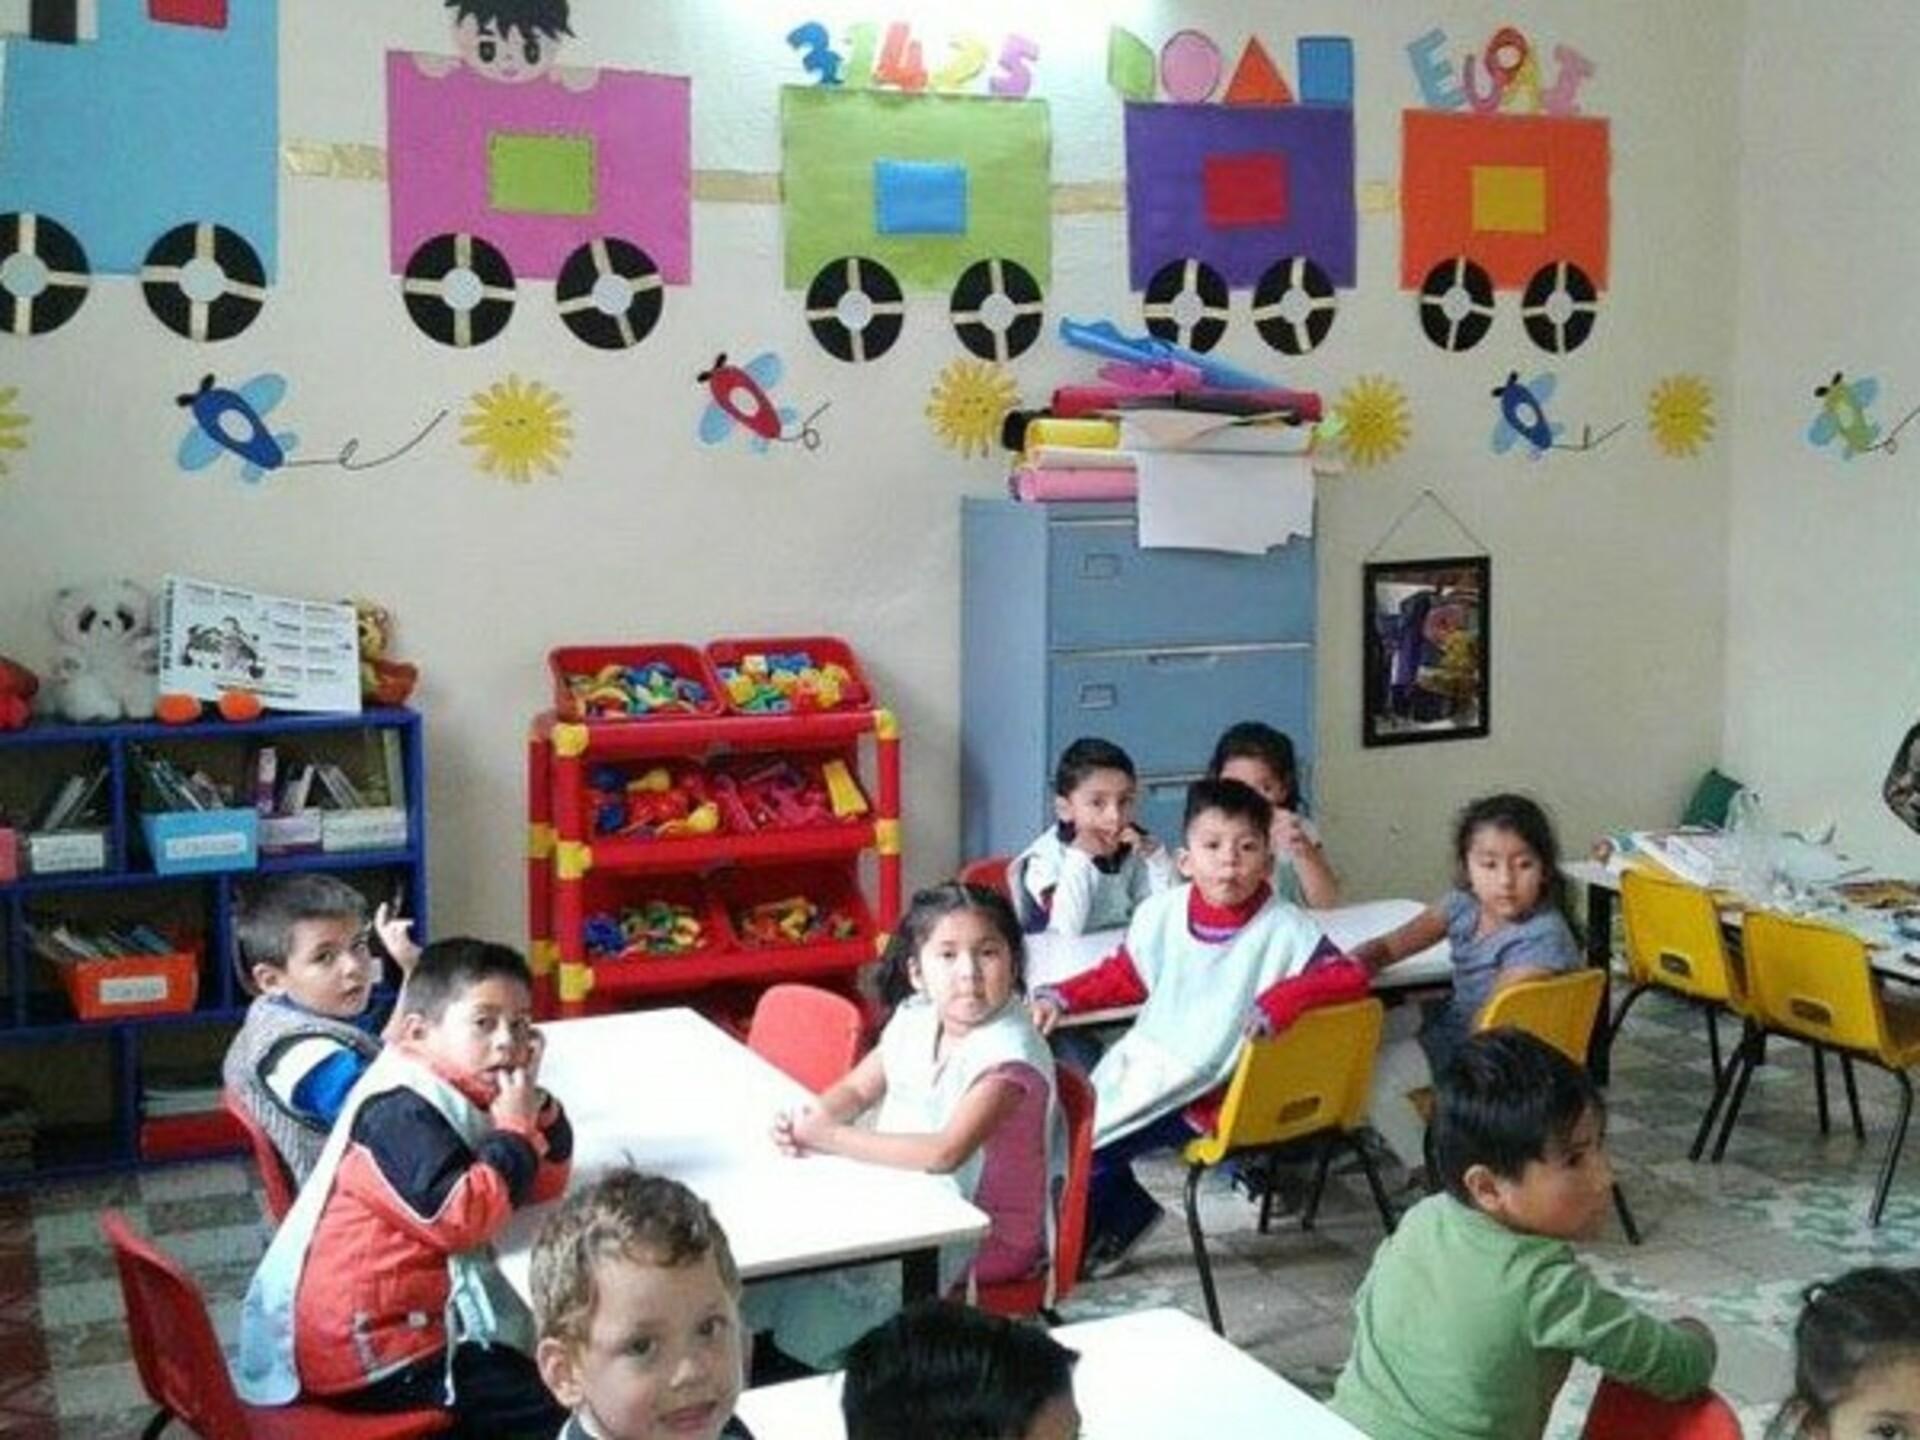 ODI weltwärts Freiwilligendienst Mexiko Kindergarten